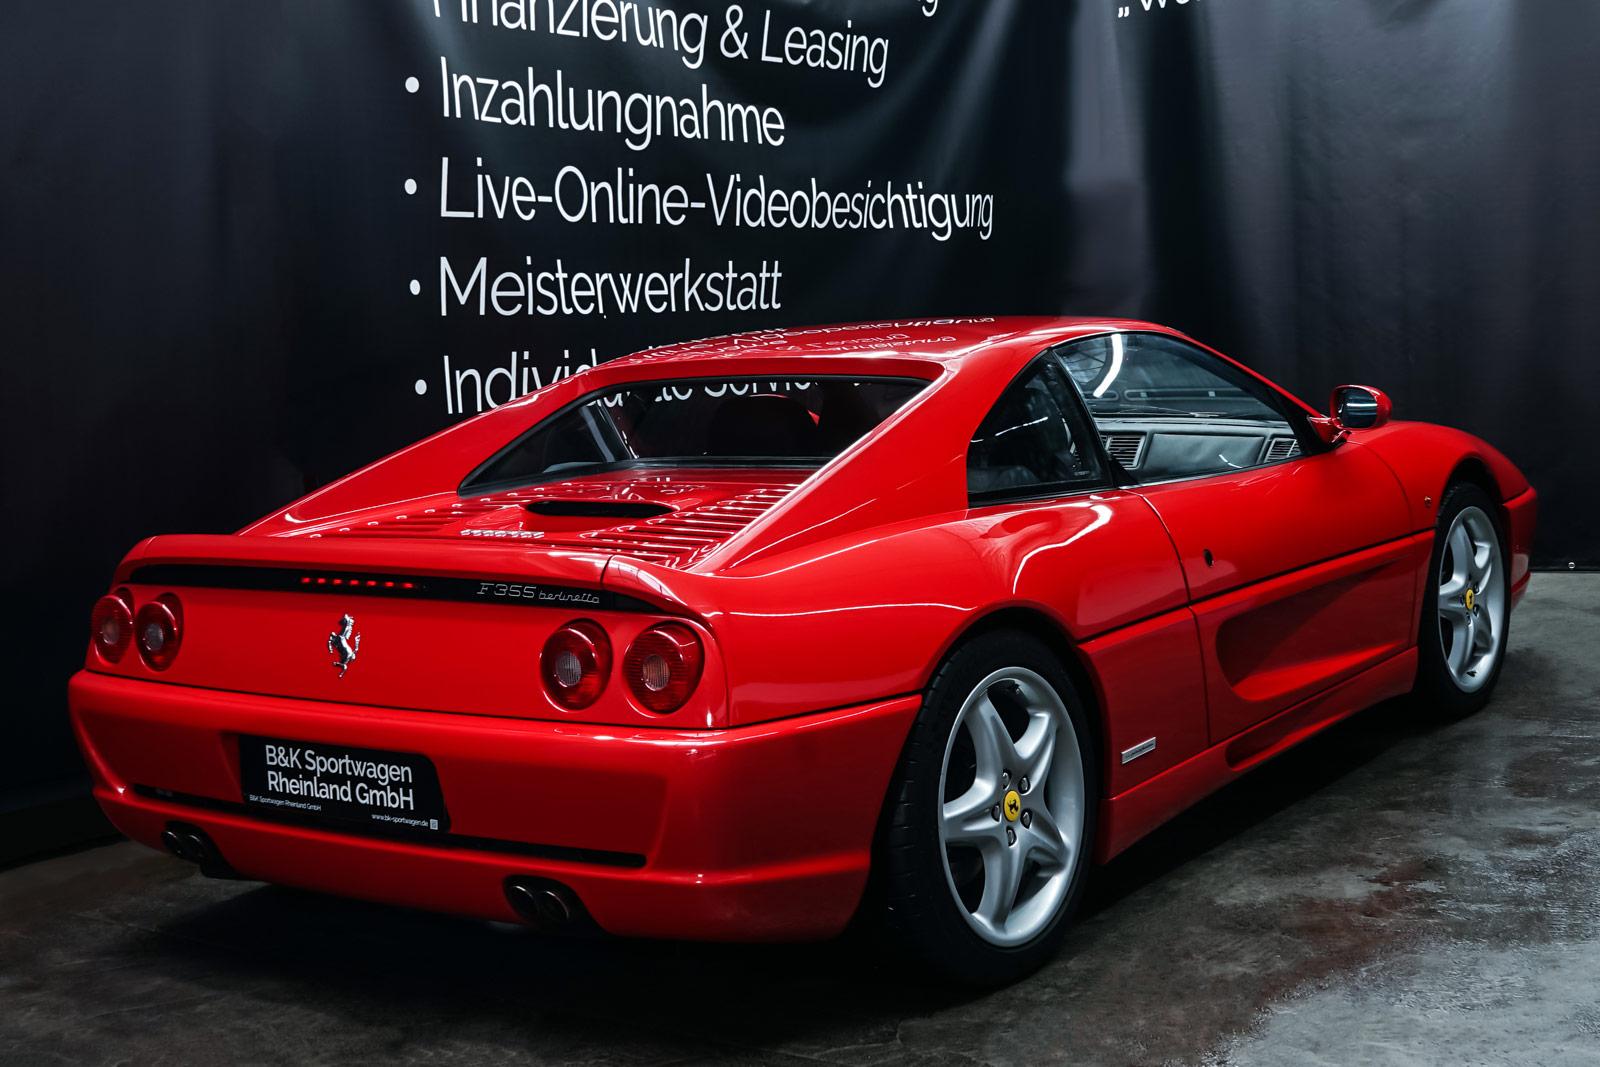 Ferrari_F355_Berlinetta_Rot_Schwarz_FER-7159_15_w